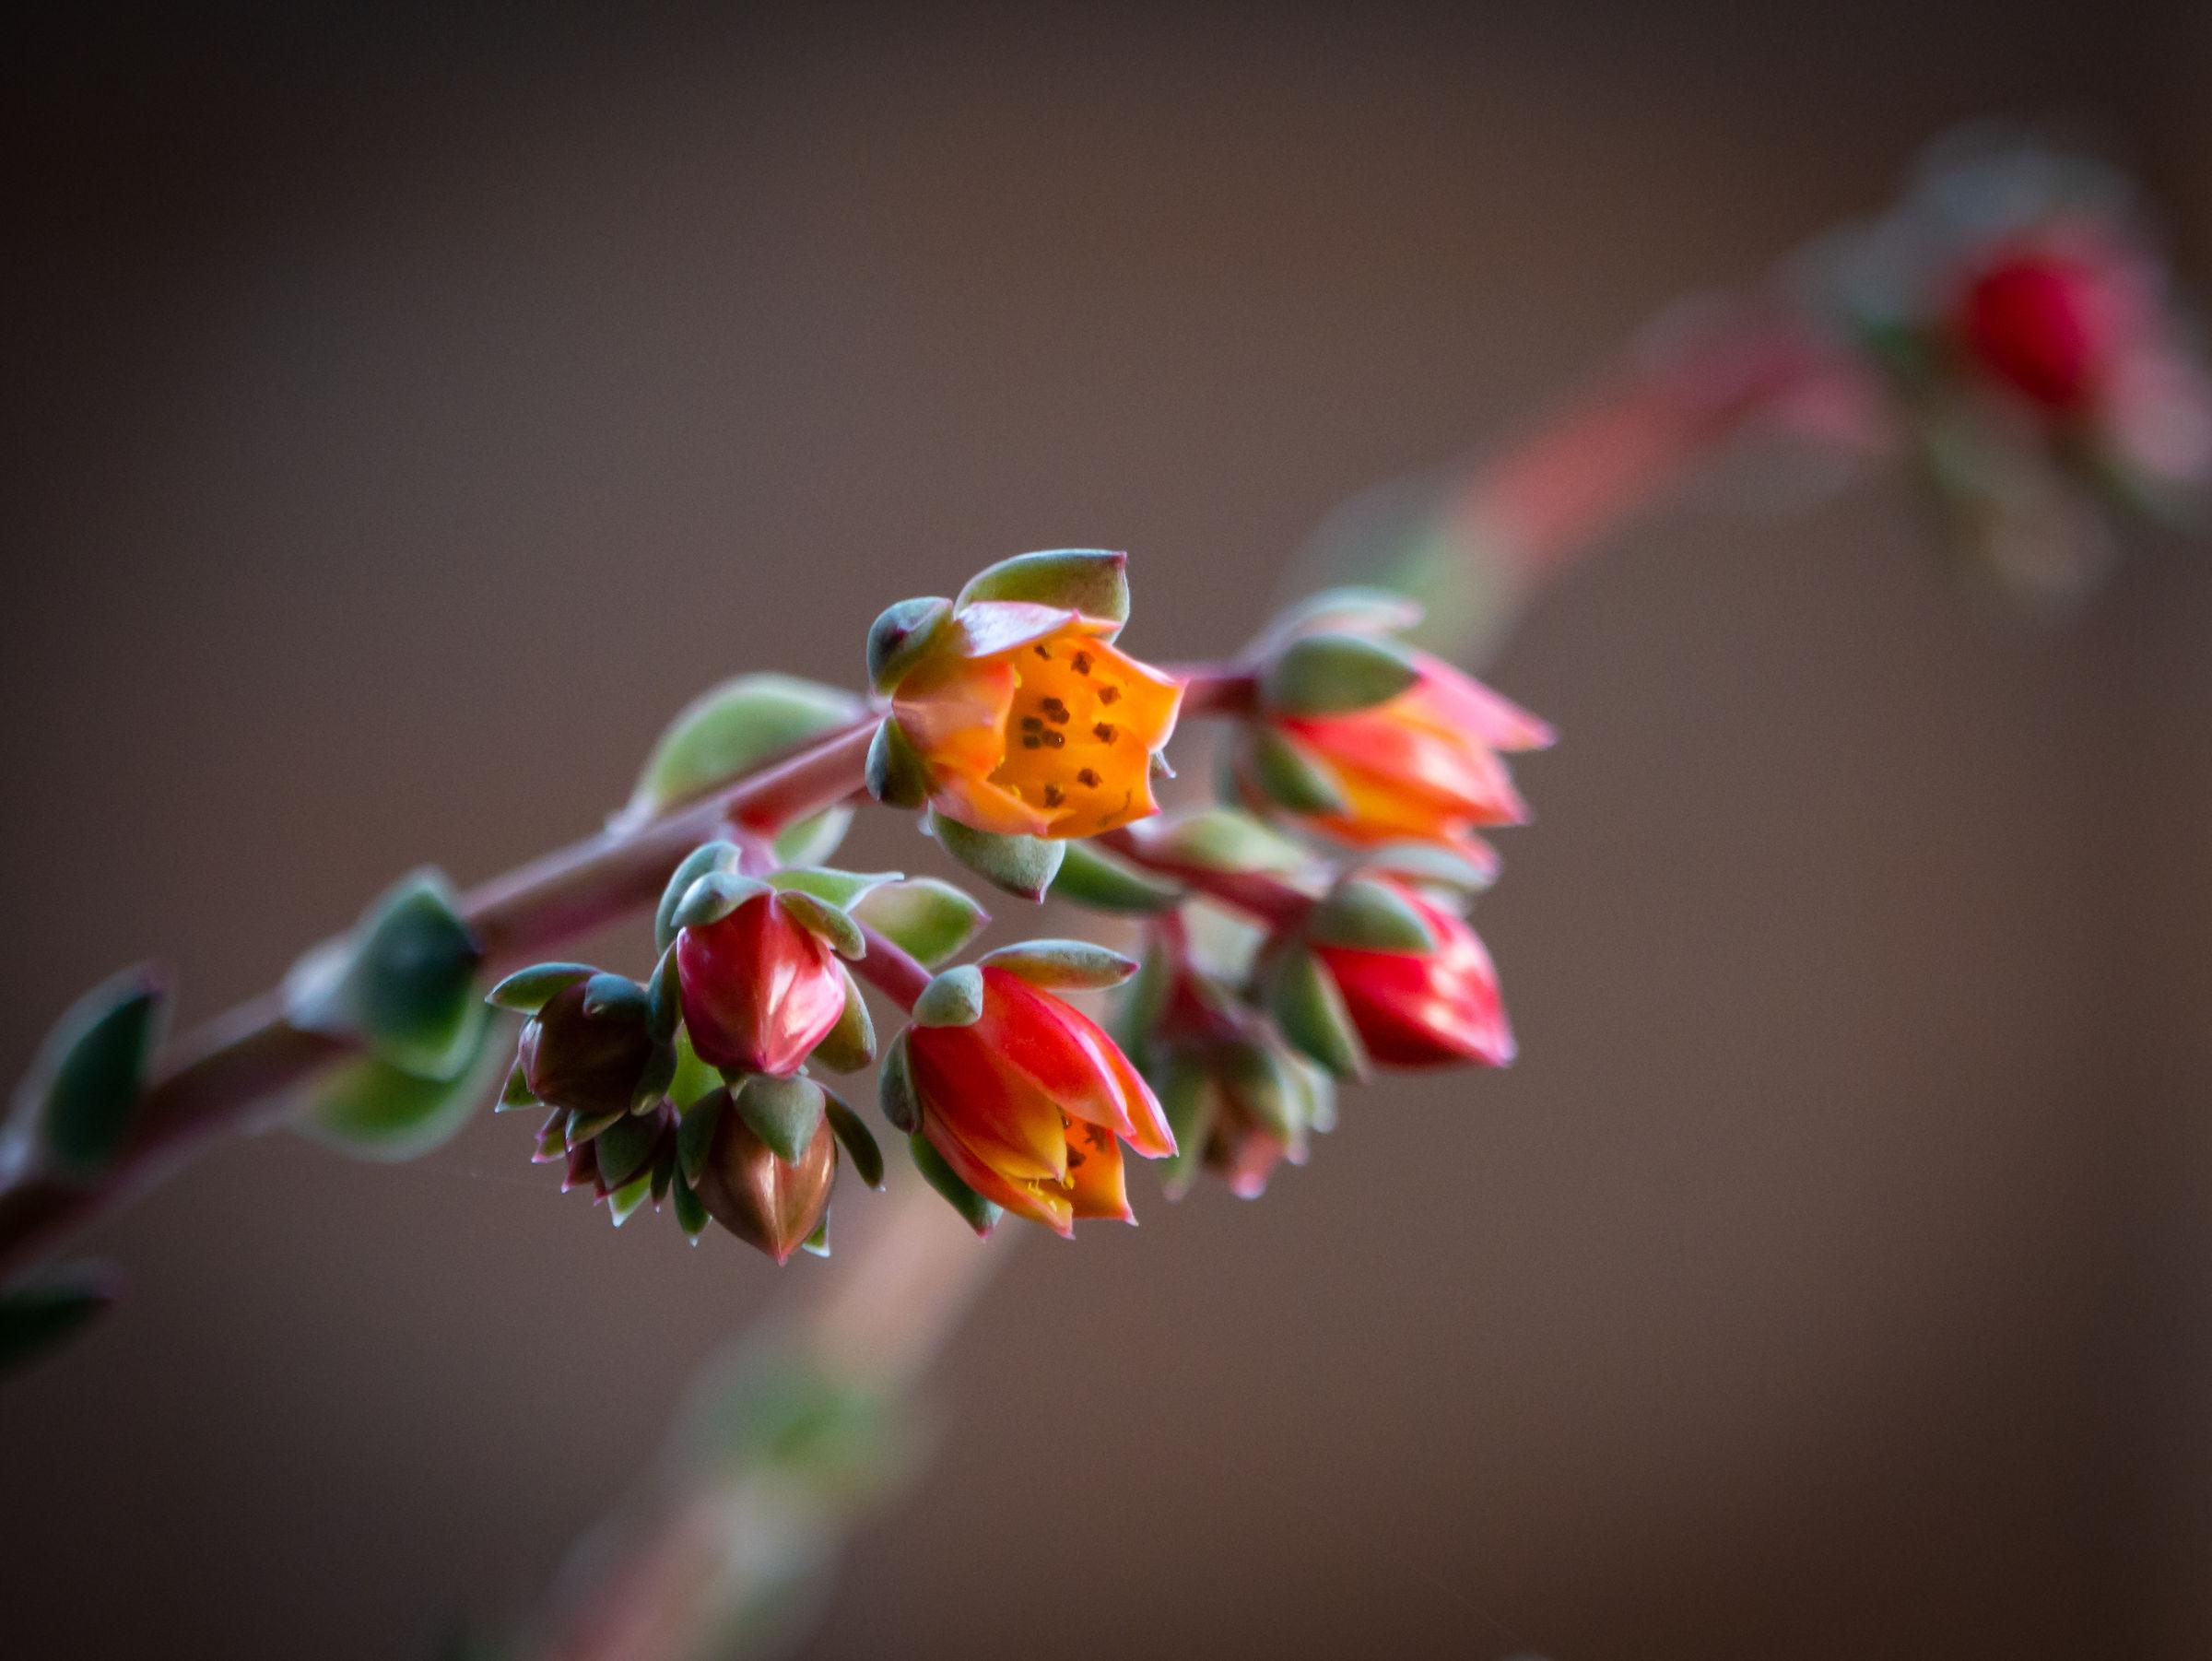 Pianta fiorita in giardino...